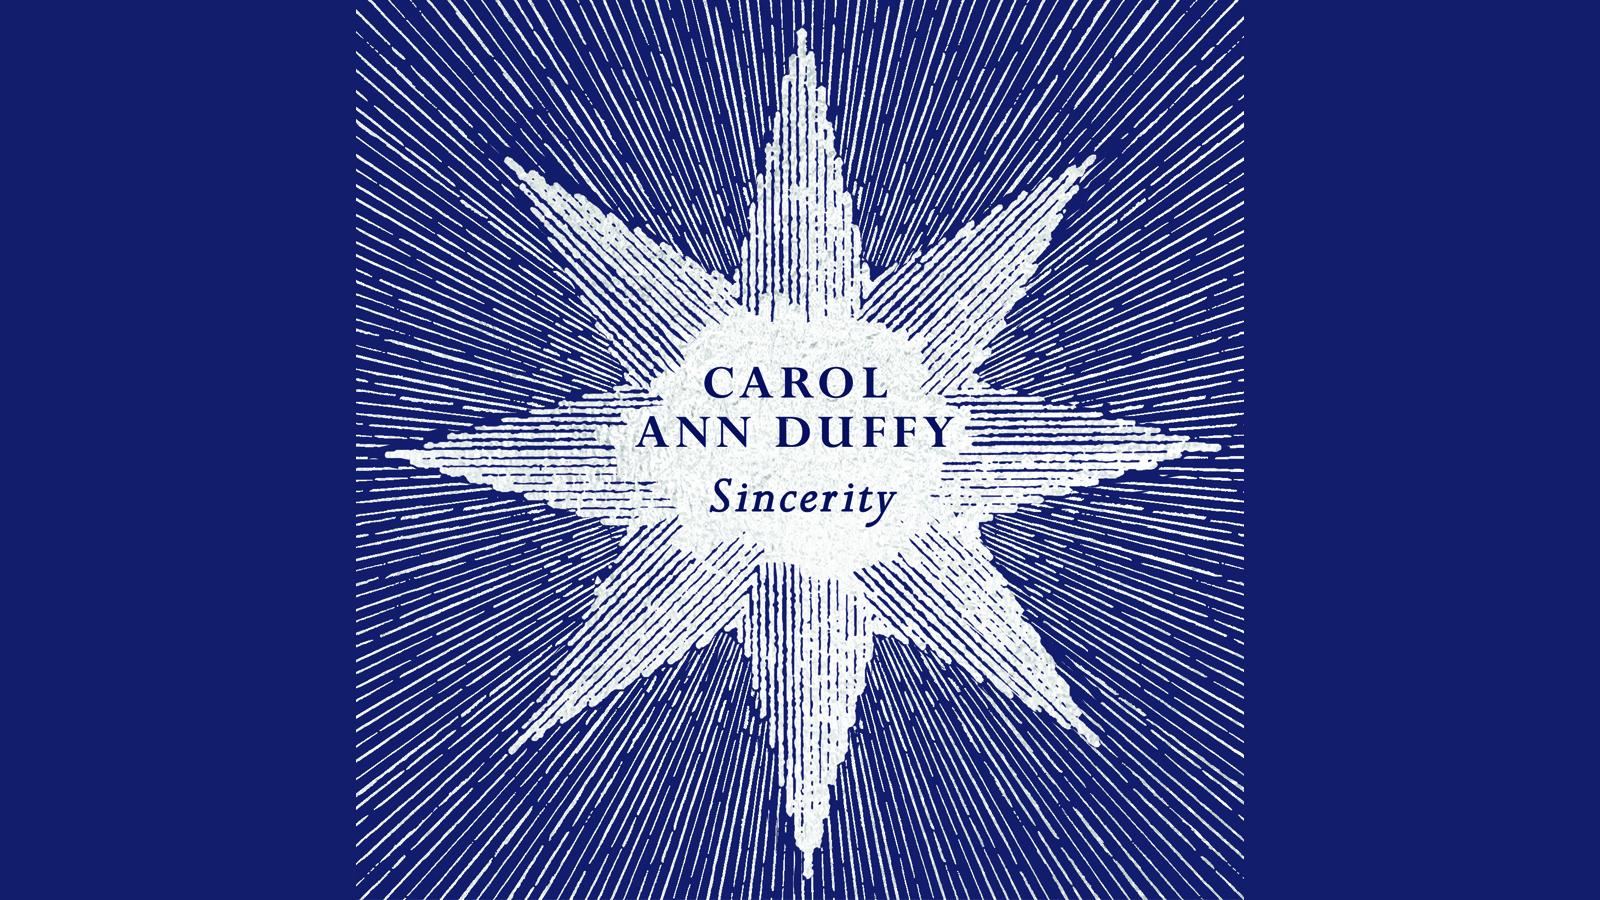 Carol Ann Duffy's favourite poems